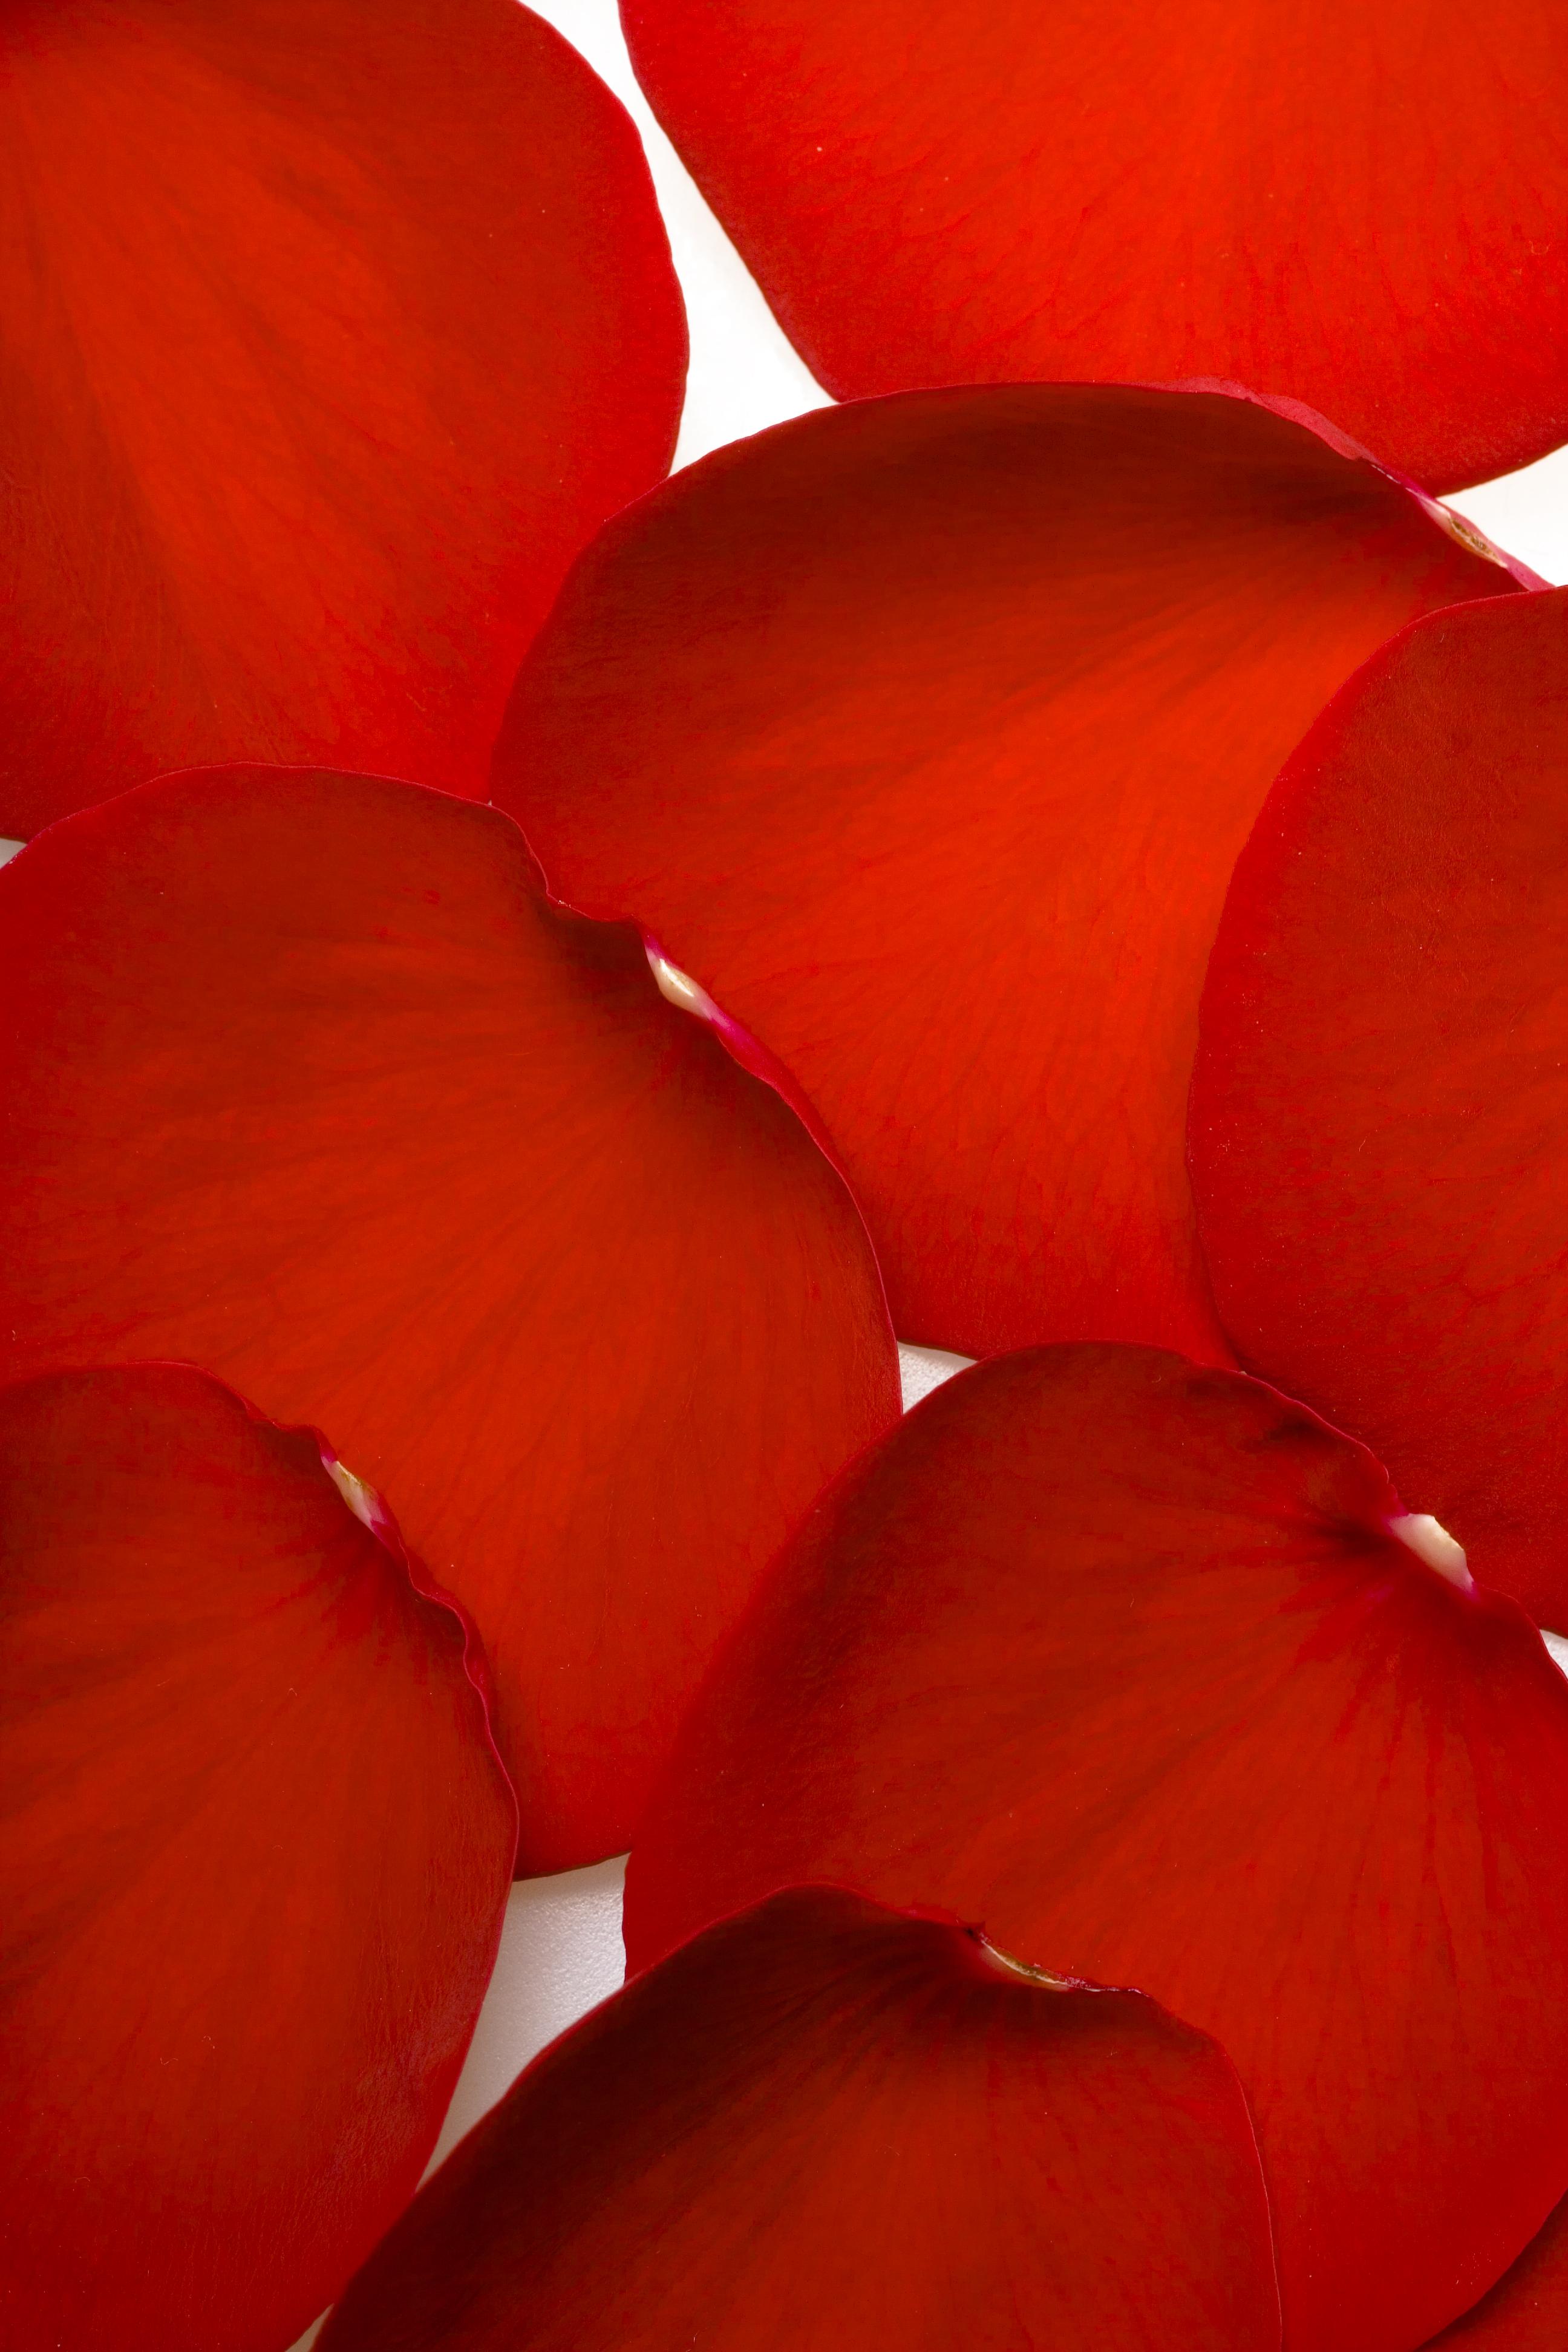 rose, Con2011, Flower, Fresh, Gift, HQ Photo